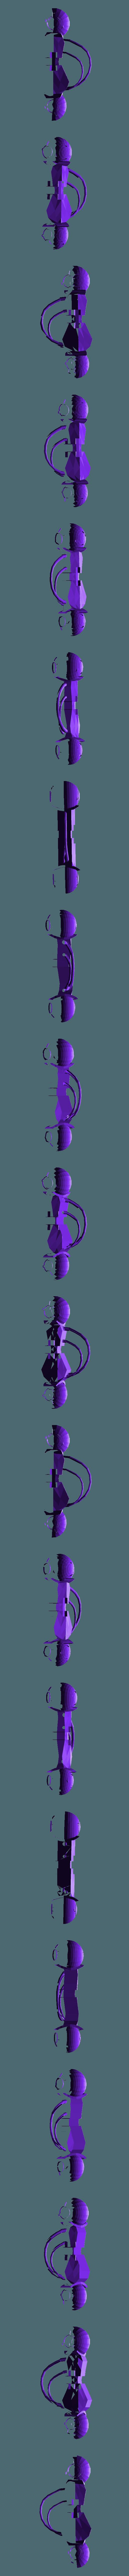 legs_pt3_6x.stl Download free STL file Serap-ta-tek BMF walker for Iron Undead • 3D printer model, JtStrait72